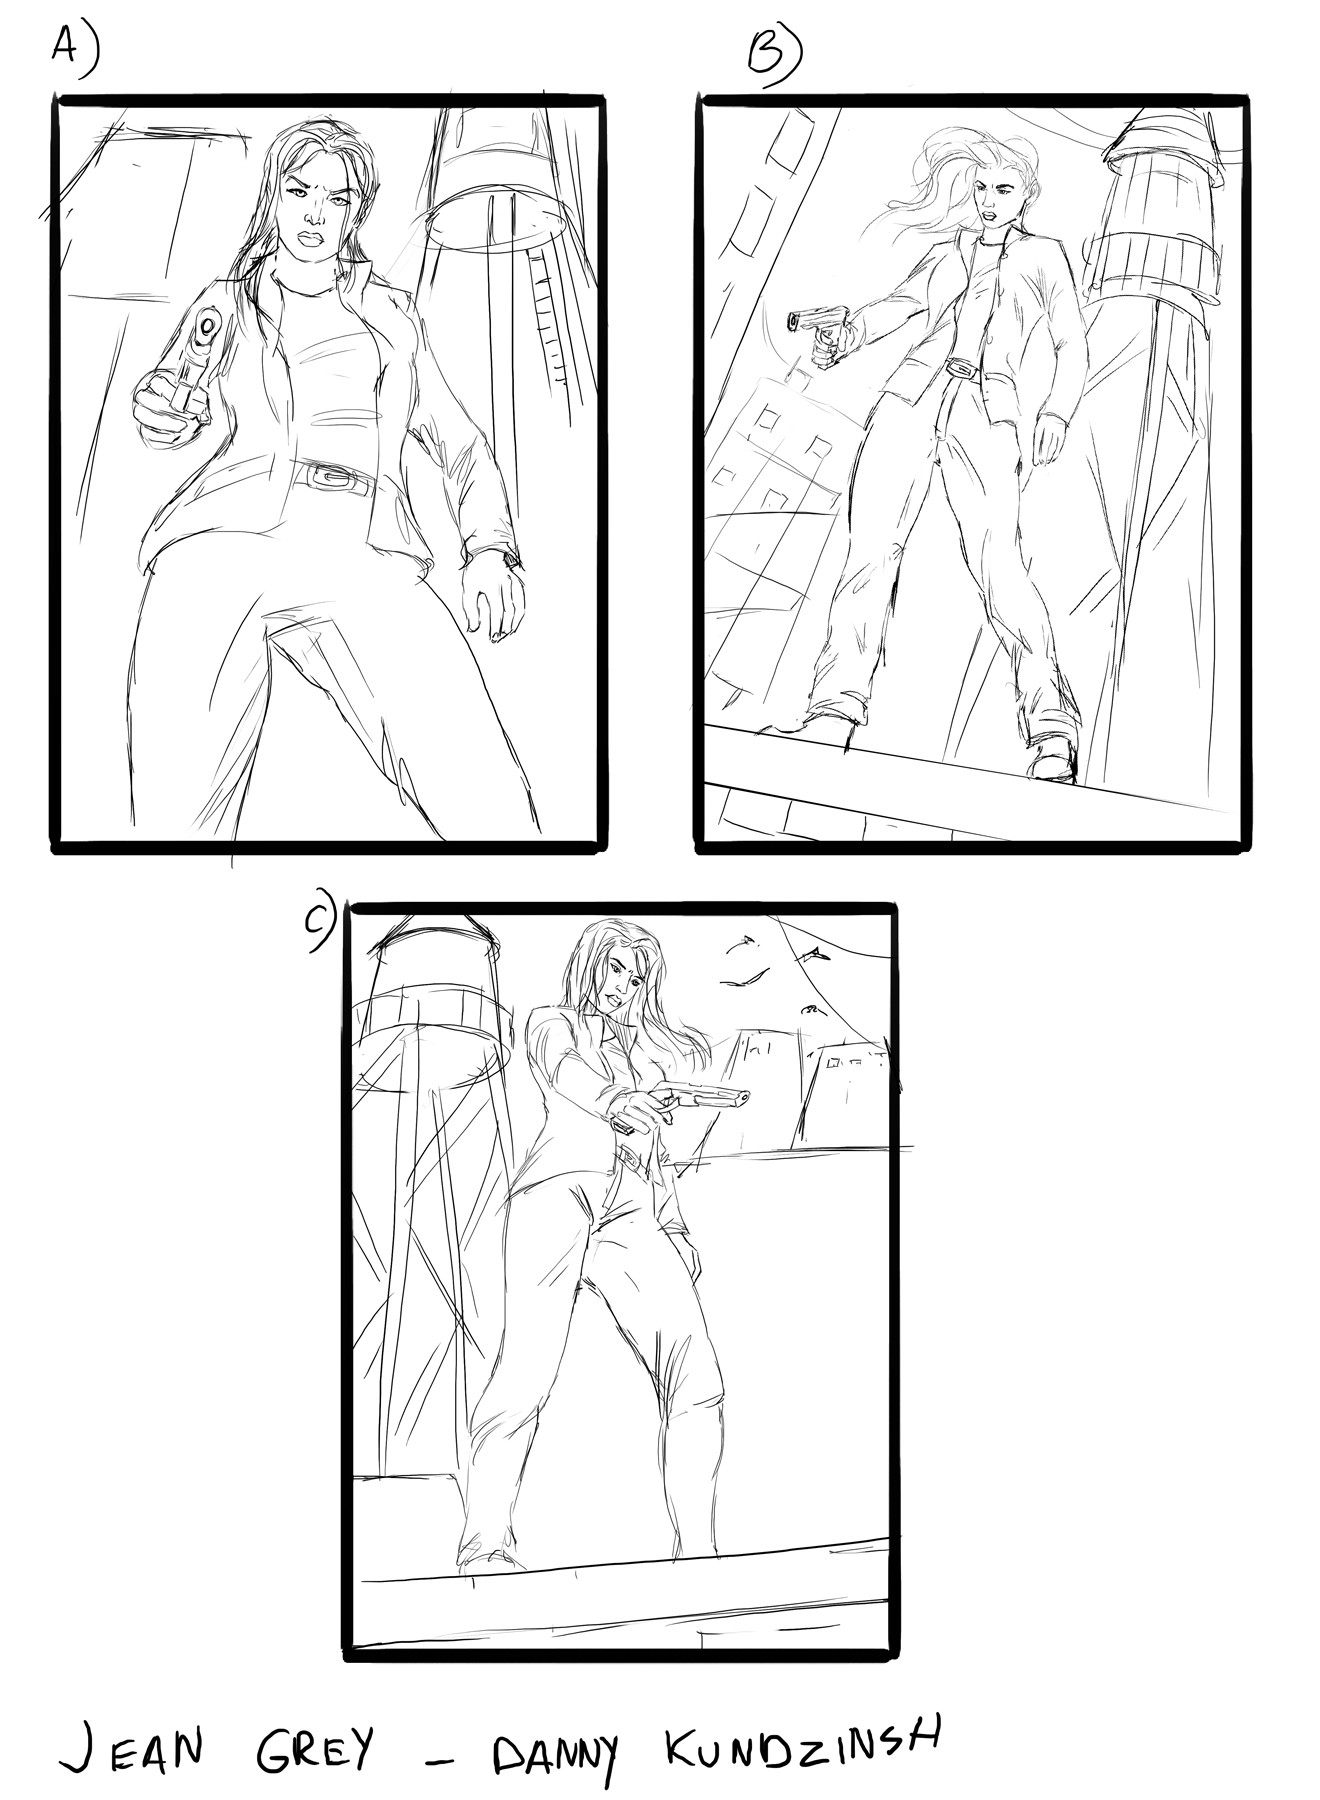 Danny kundzinsh jean grey sketches